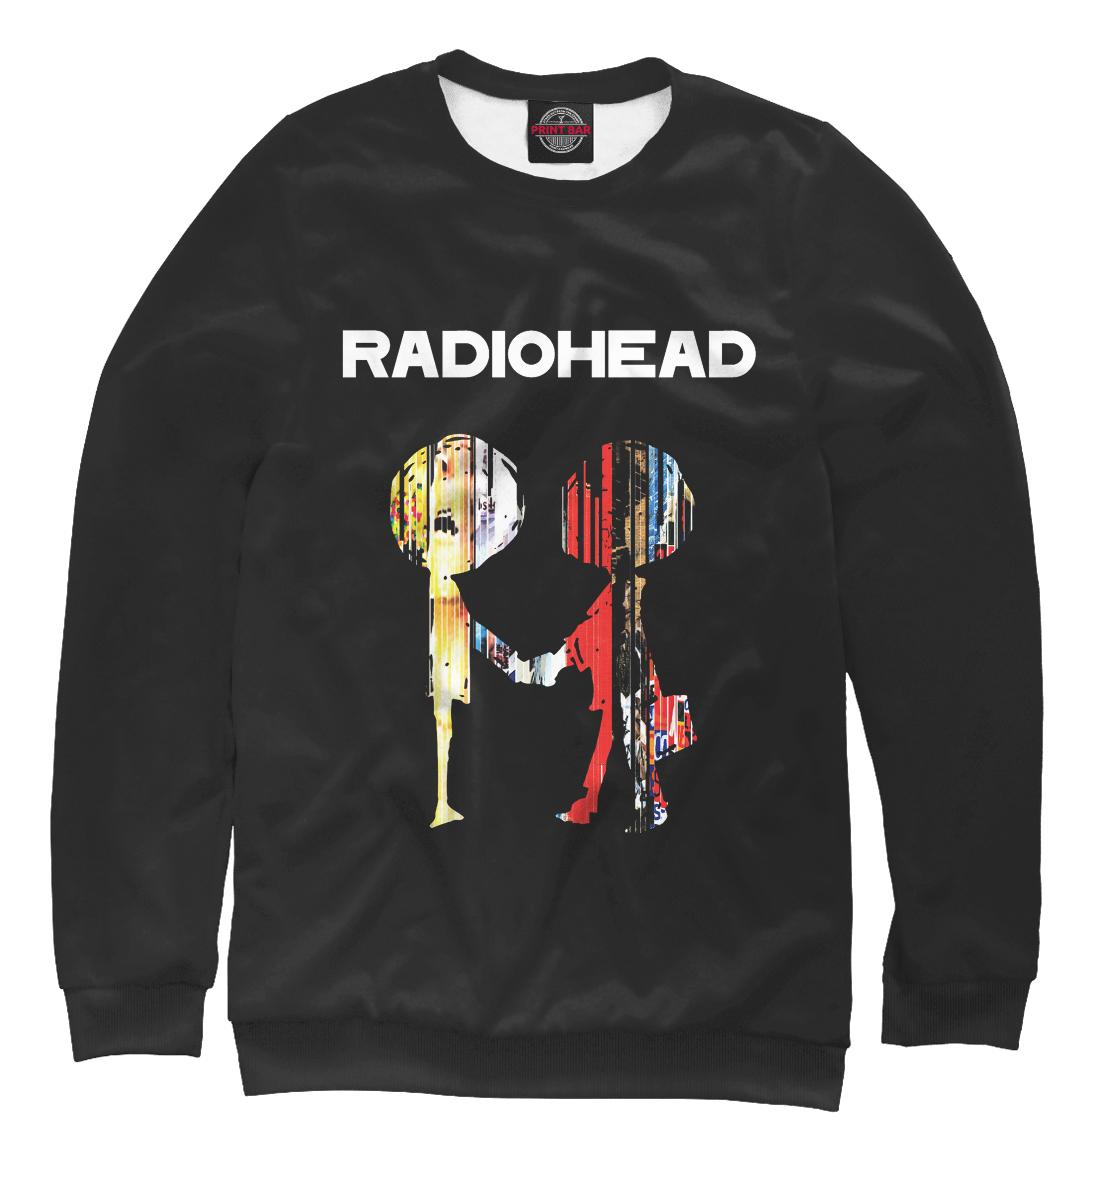 Купить Radiohead, Printbar, Свитшоты, RDH-309390-swi-2